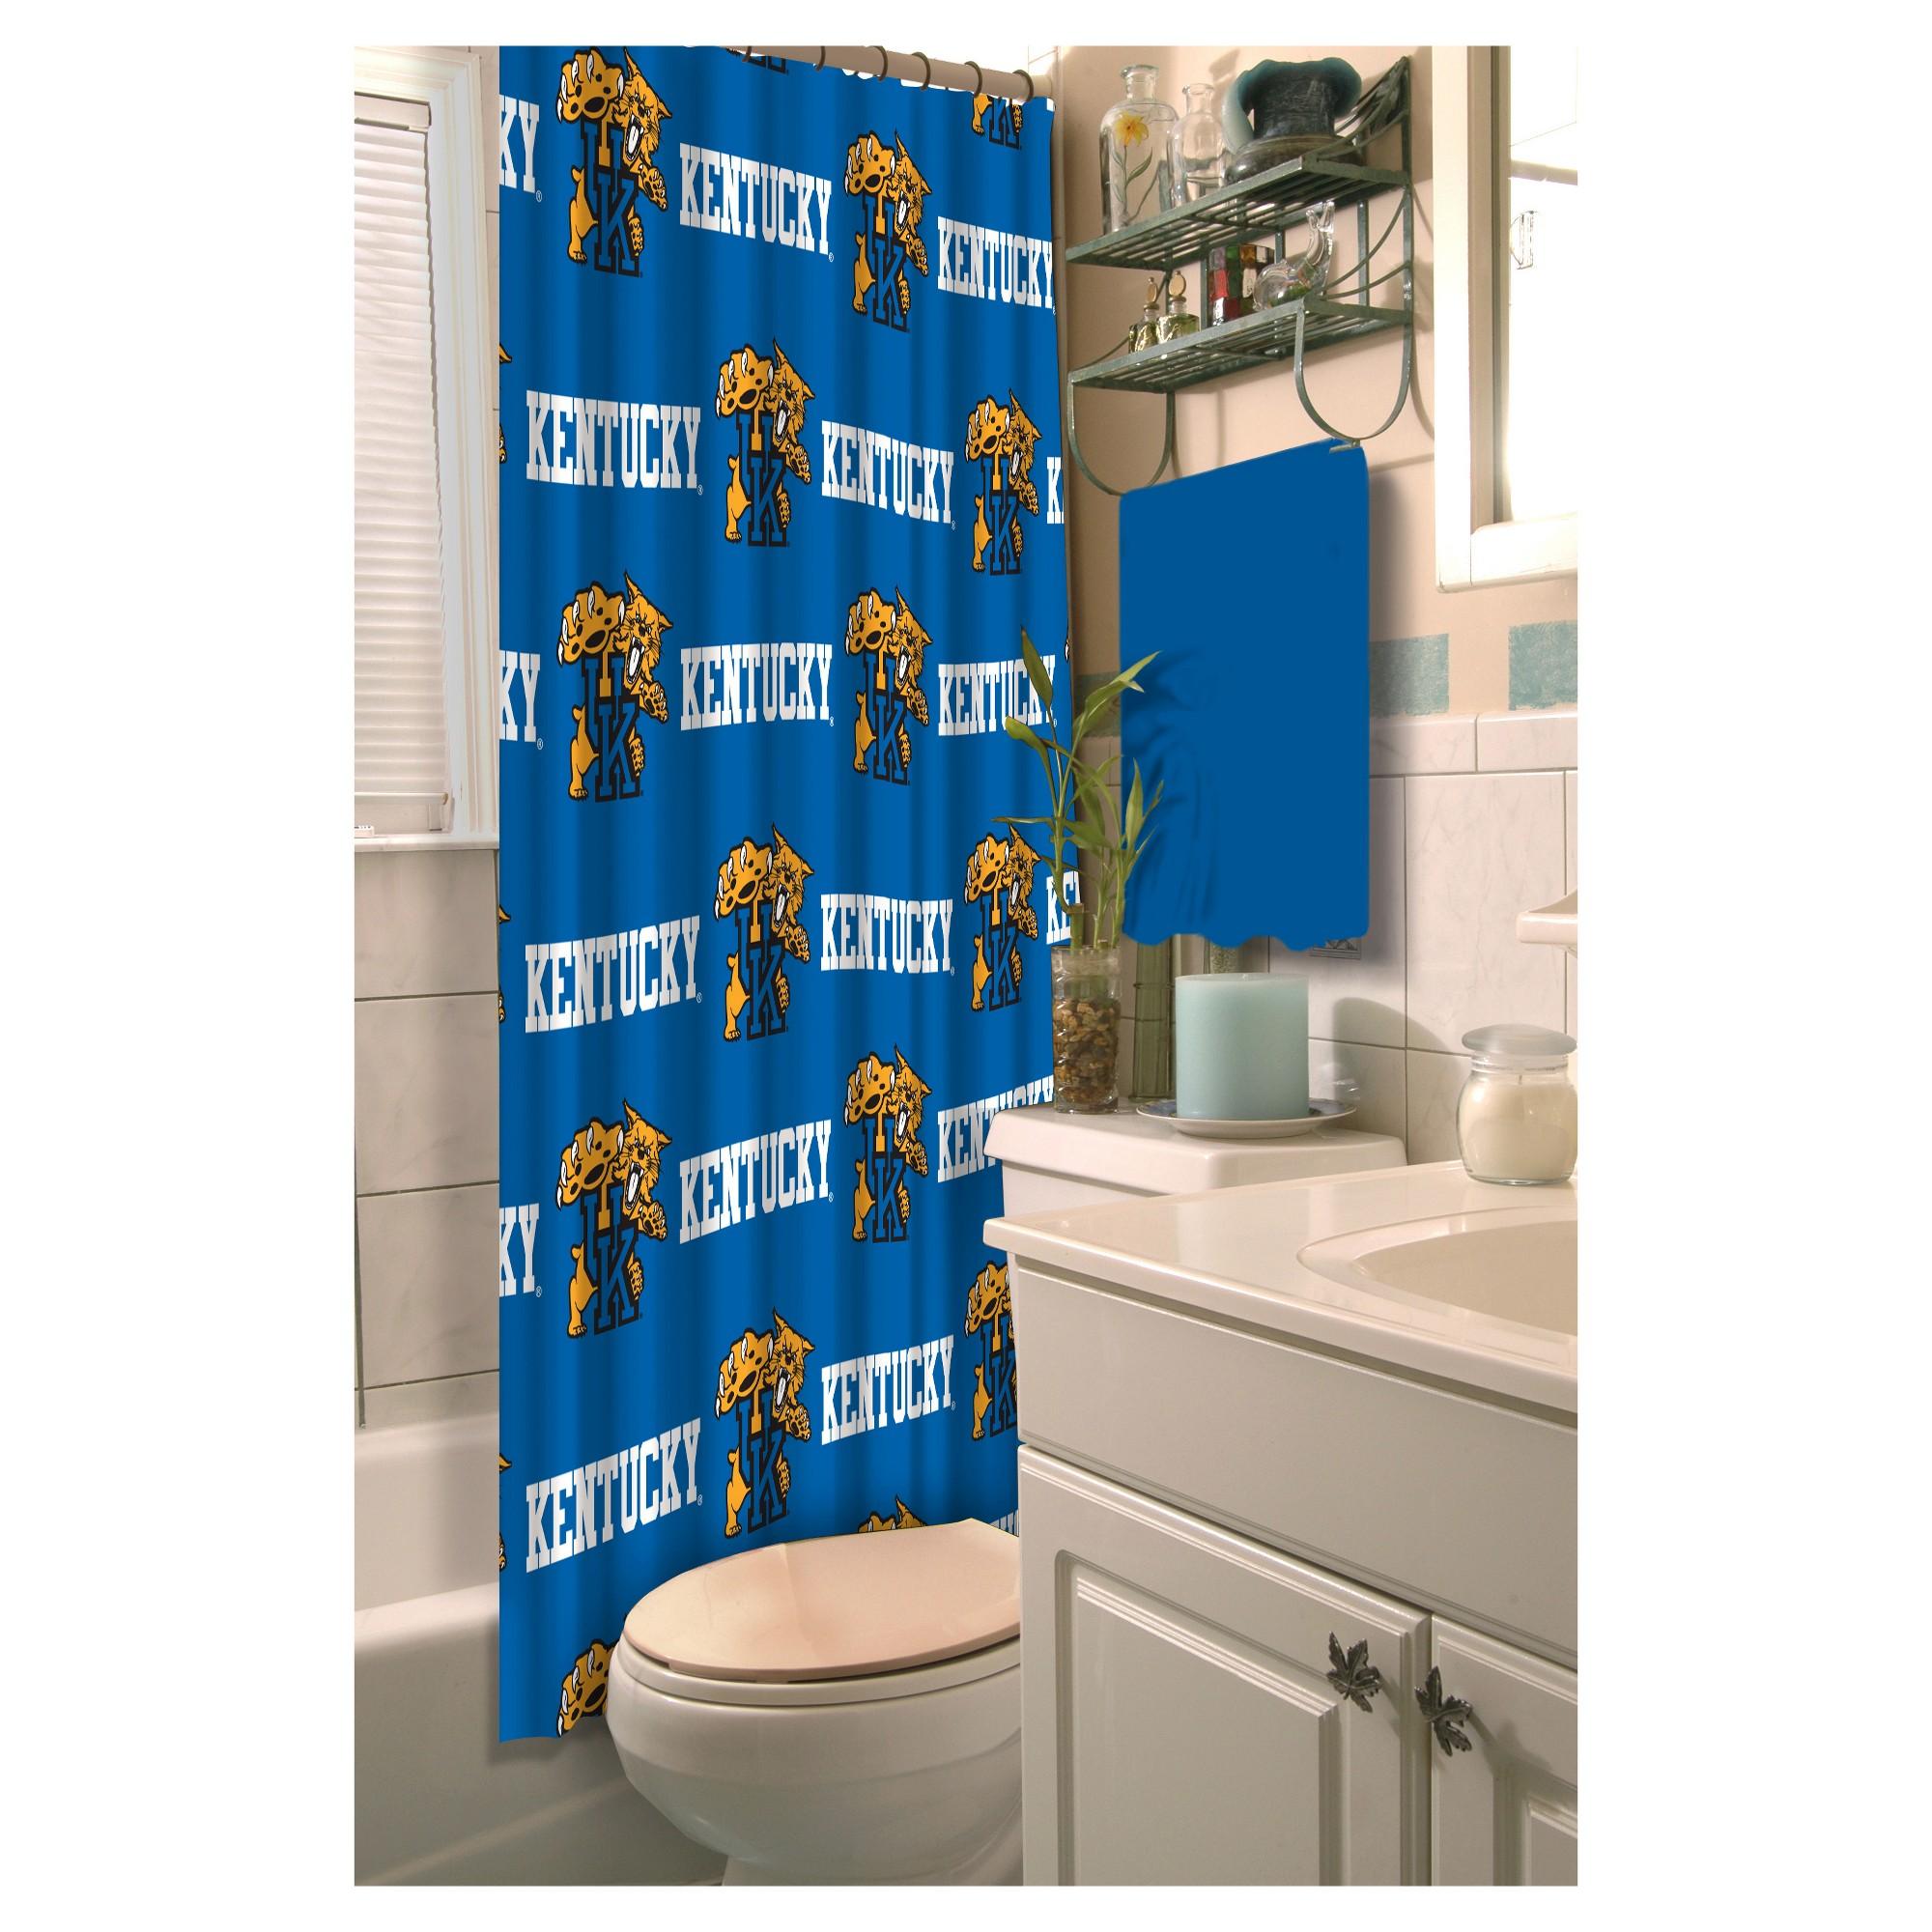 Ncaakentucky wildcats shower curtain kentucky wildcats products